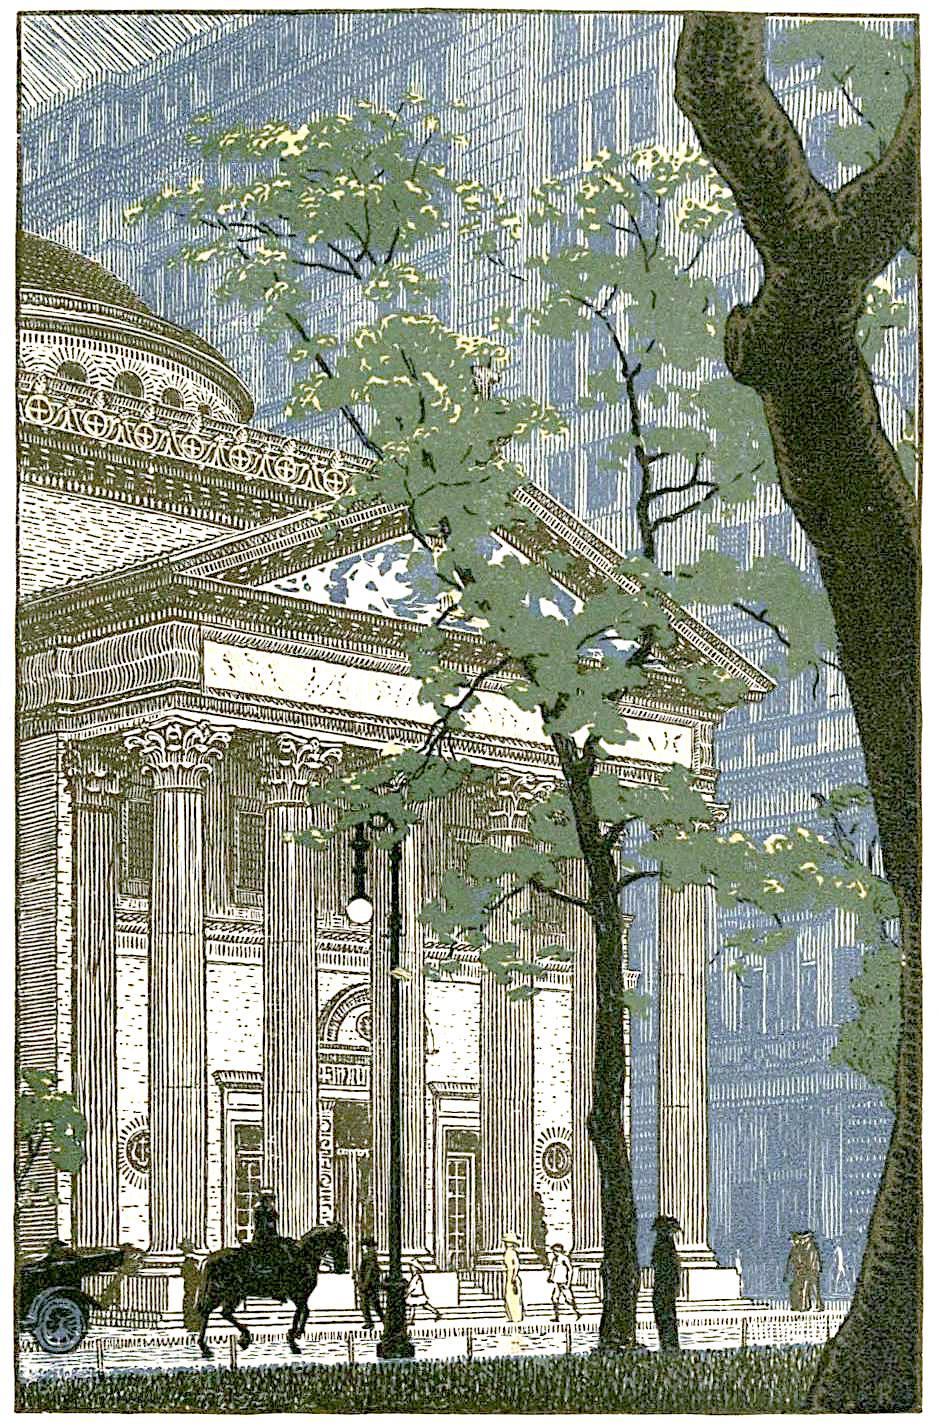 Rudolph Ruzicka art, large urban buildings